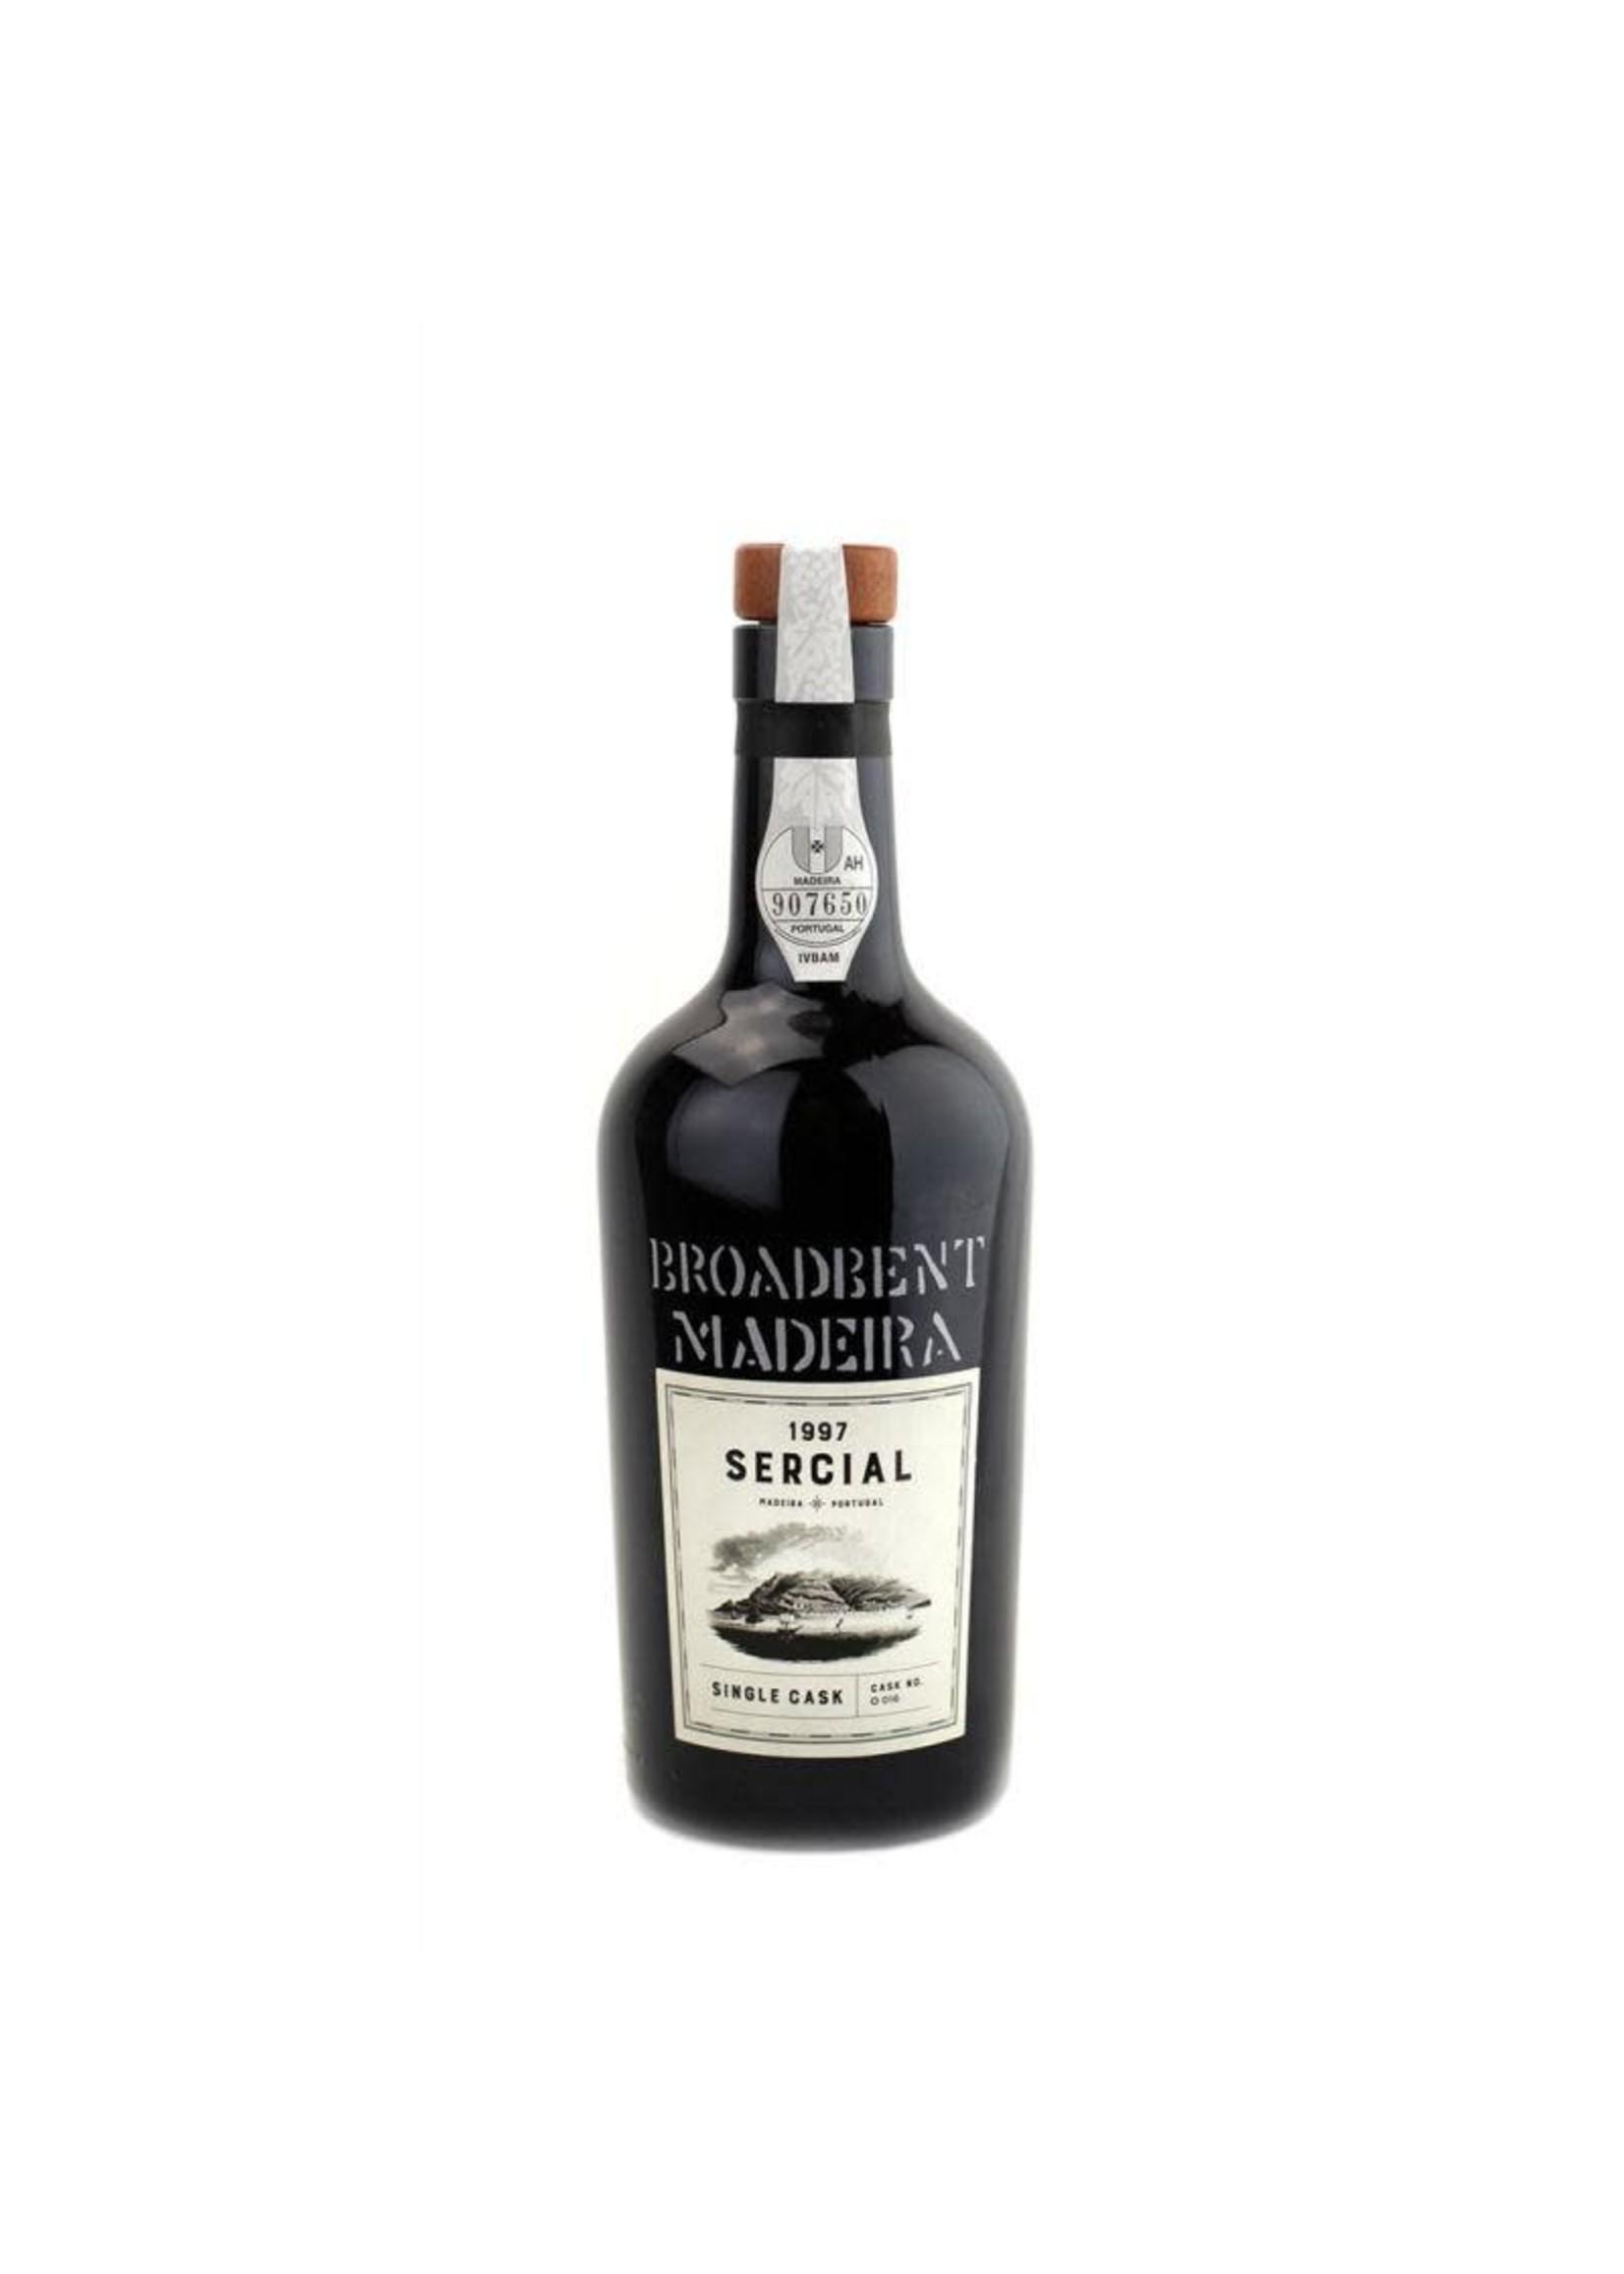 Broadbent Broadbent Madeira 1997 Single Cask Sercial